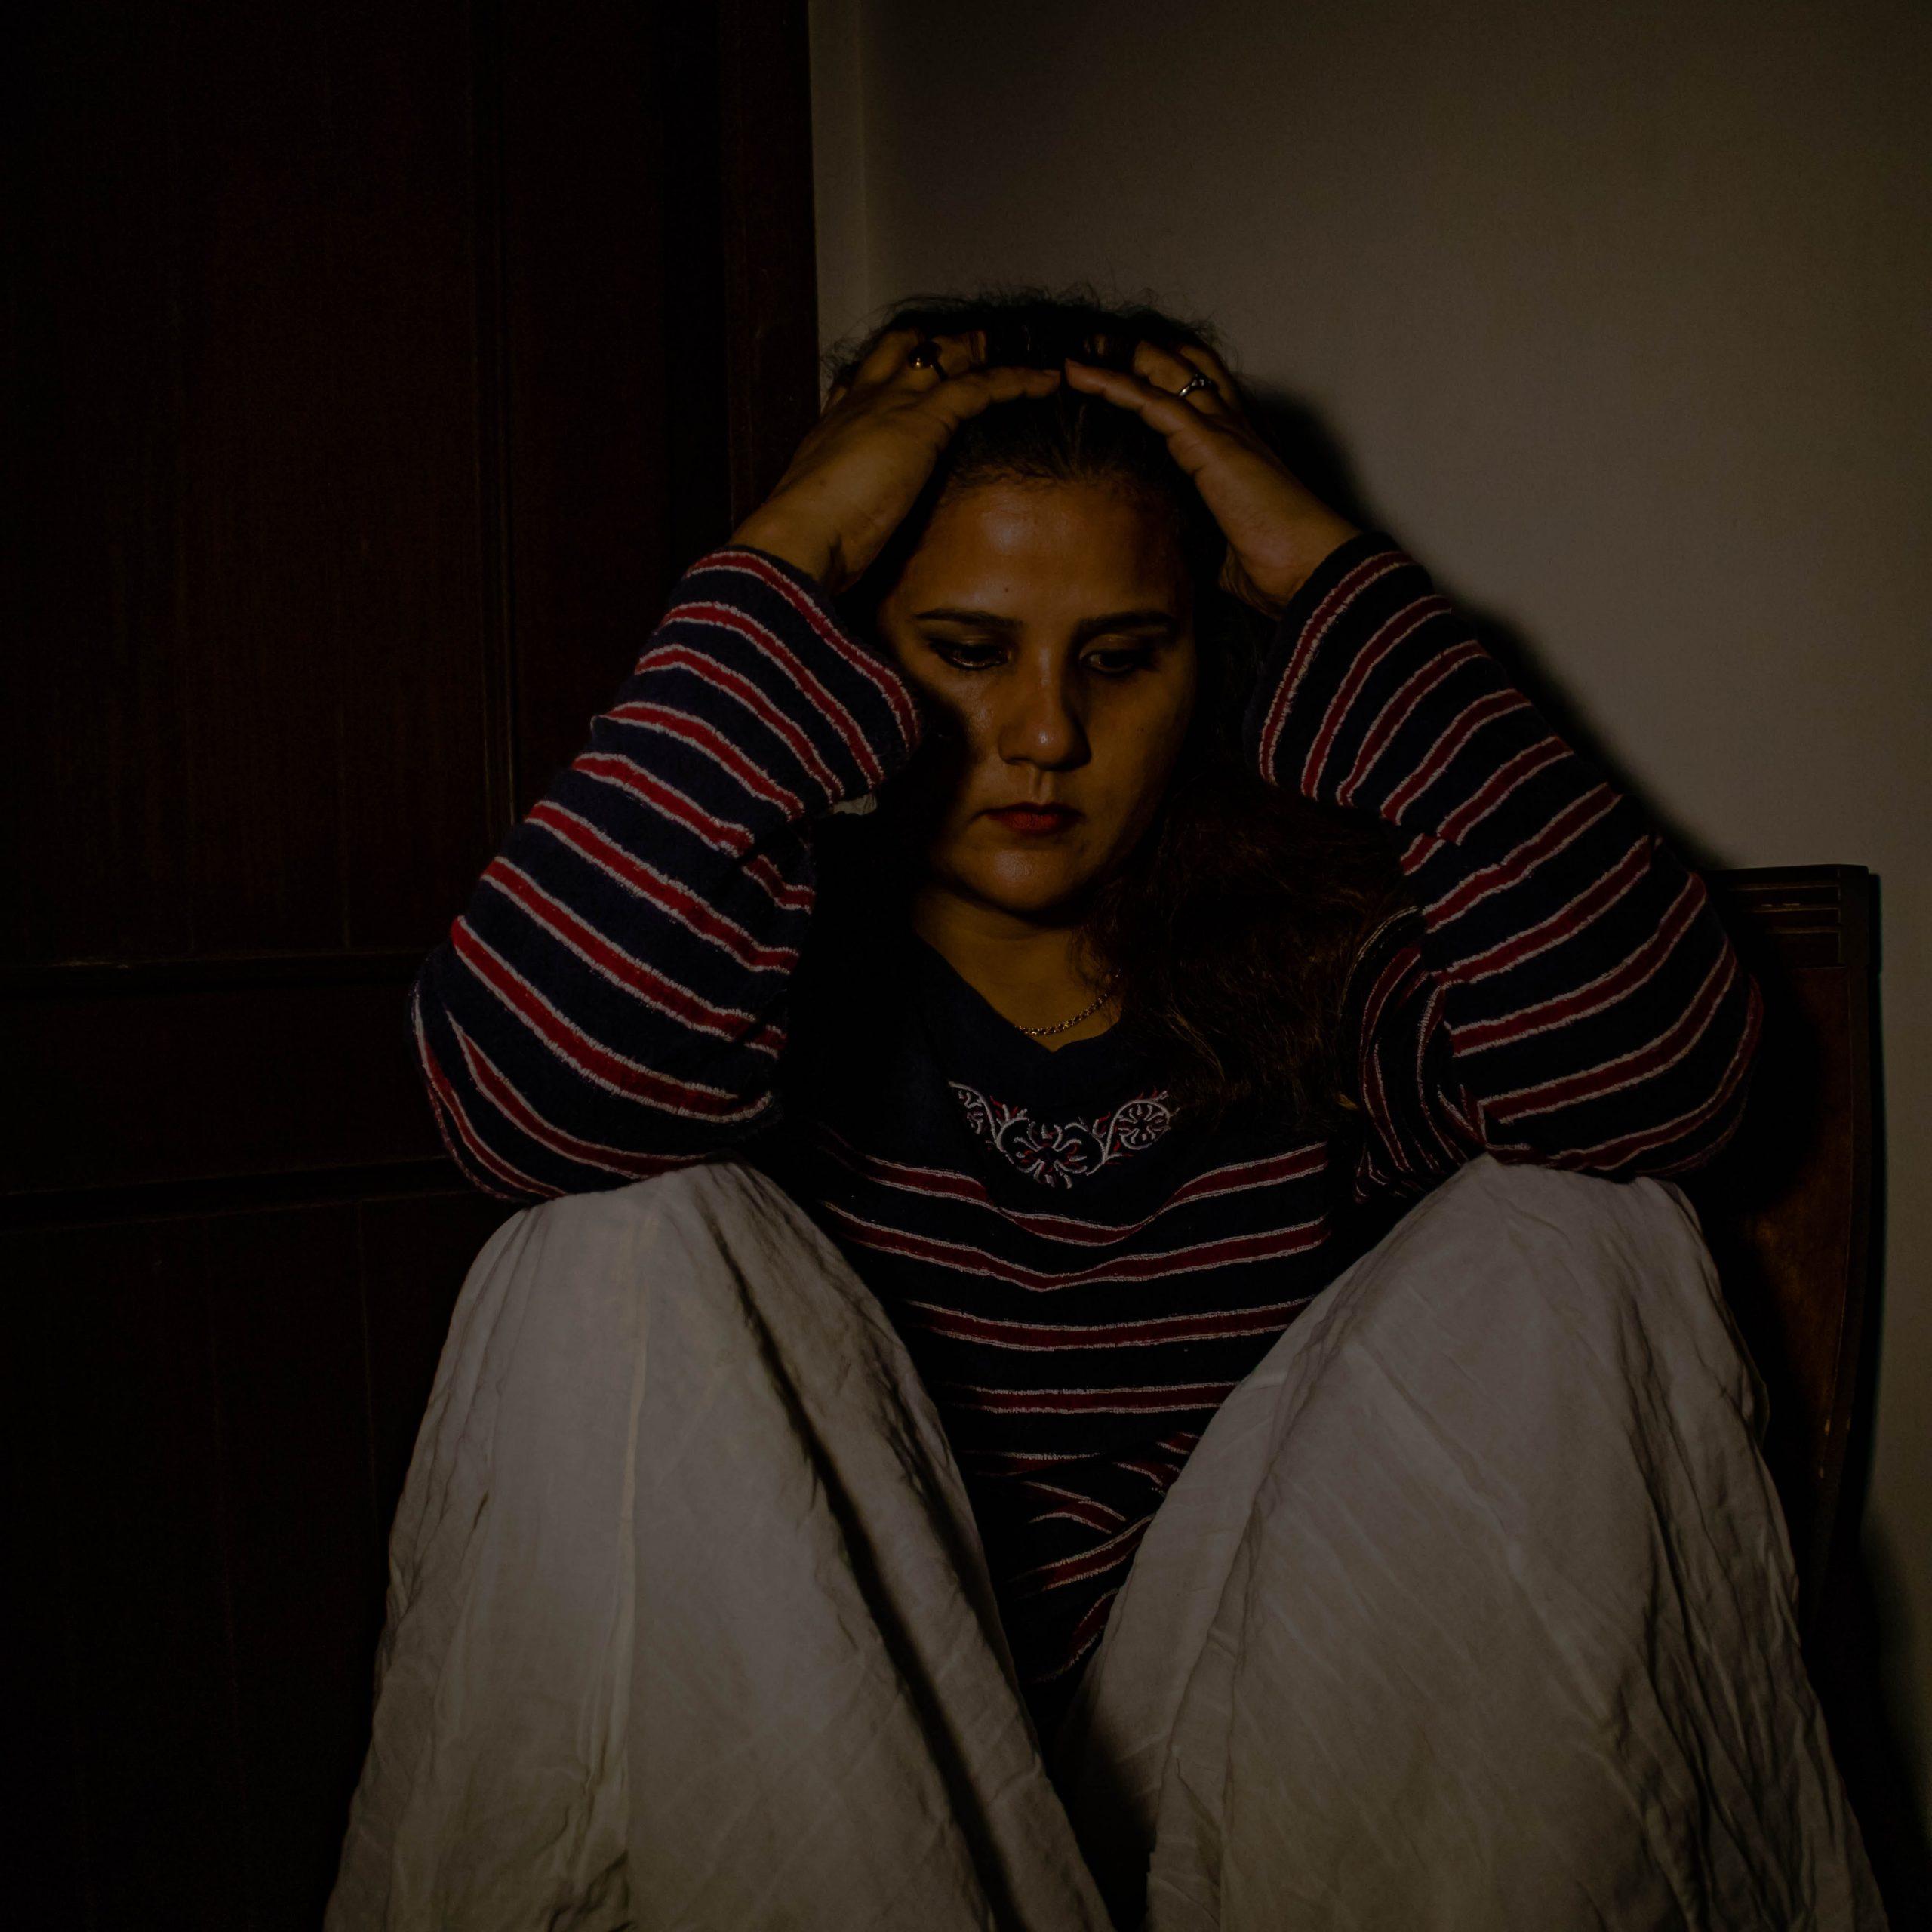 Non-Suicidal Self-Injury